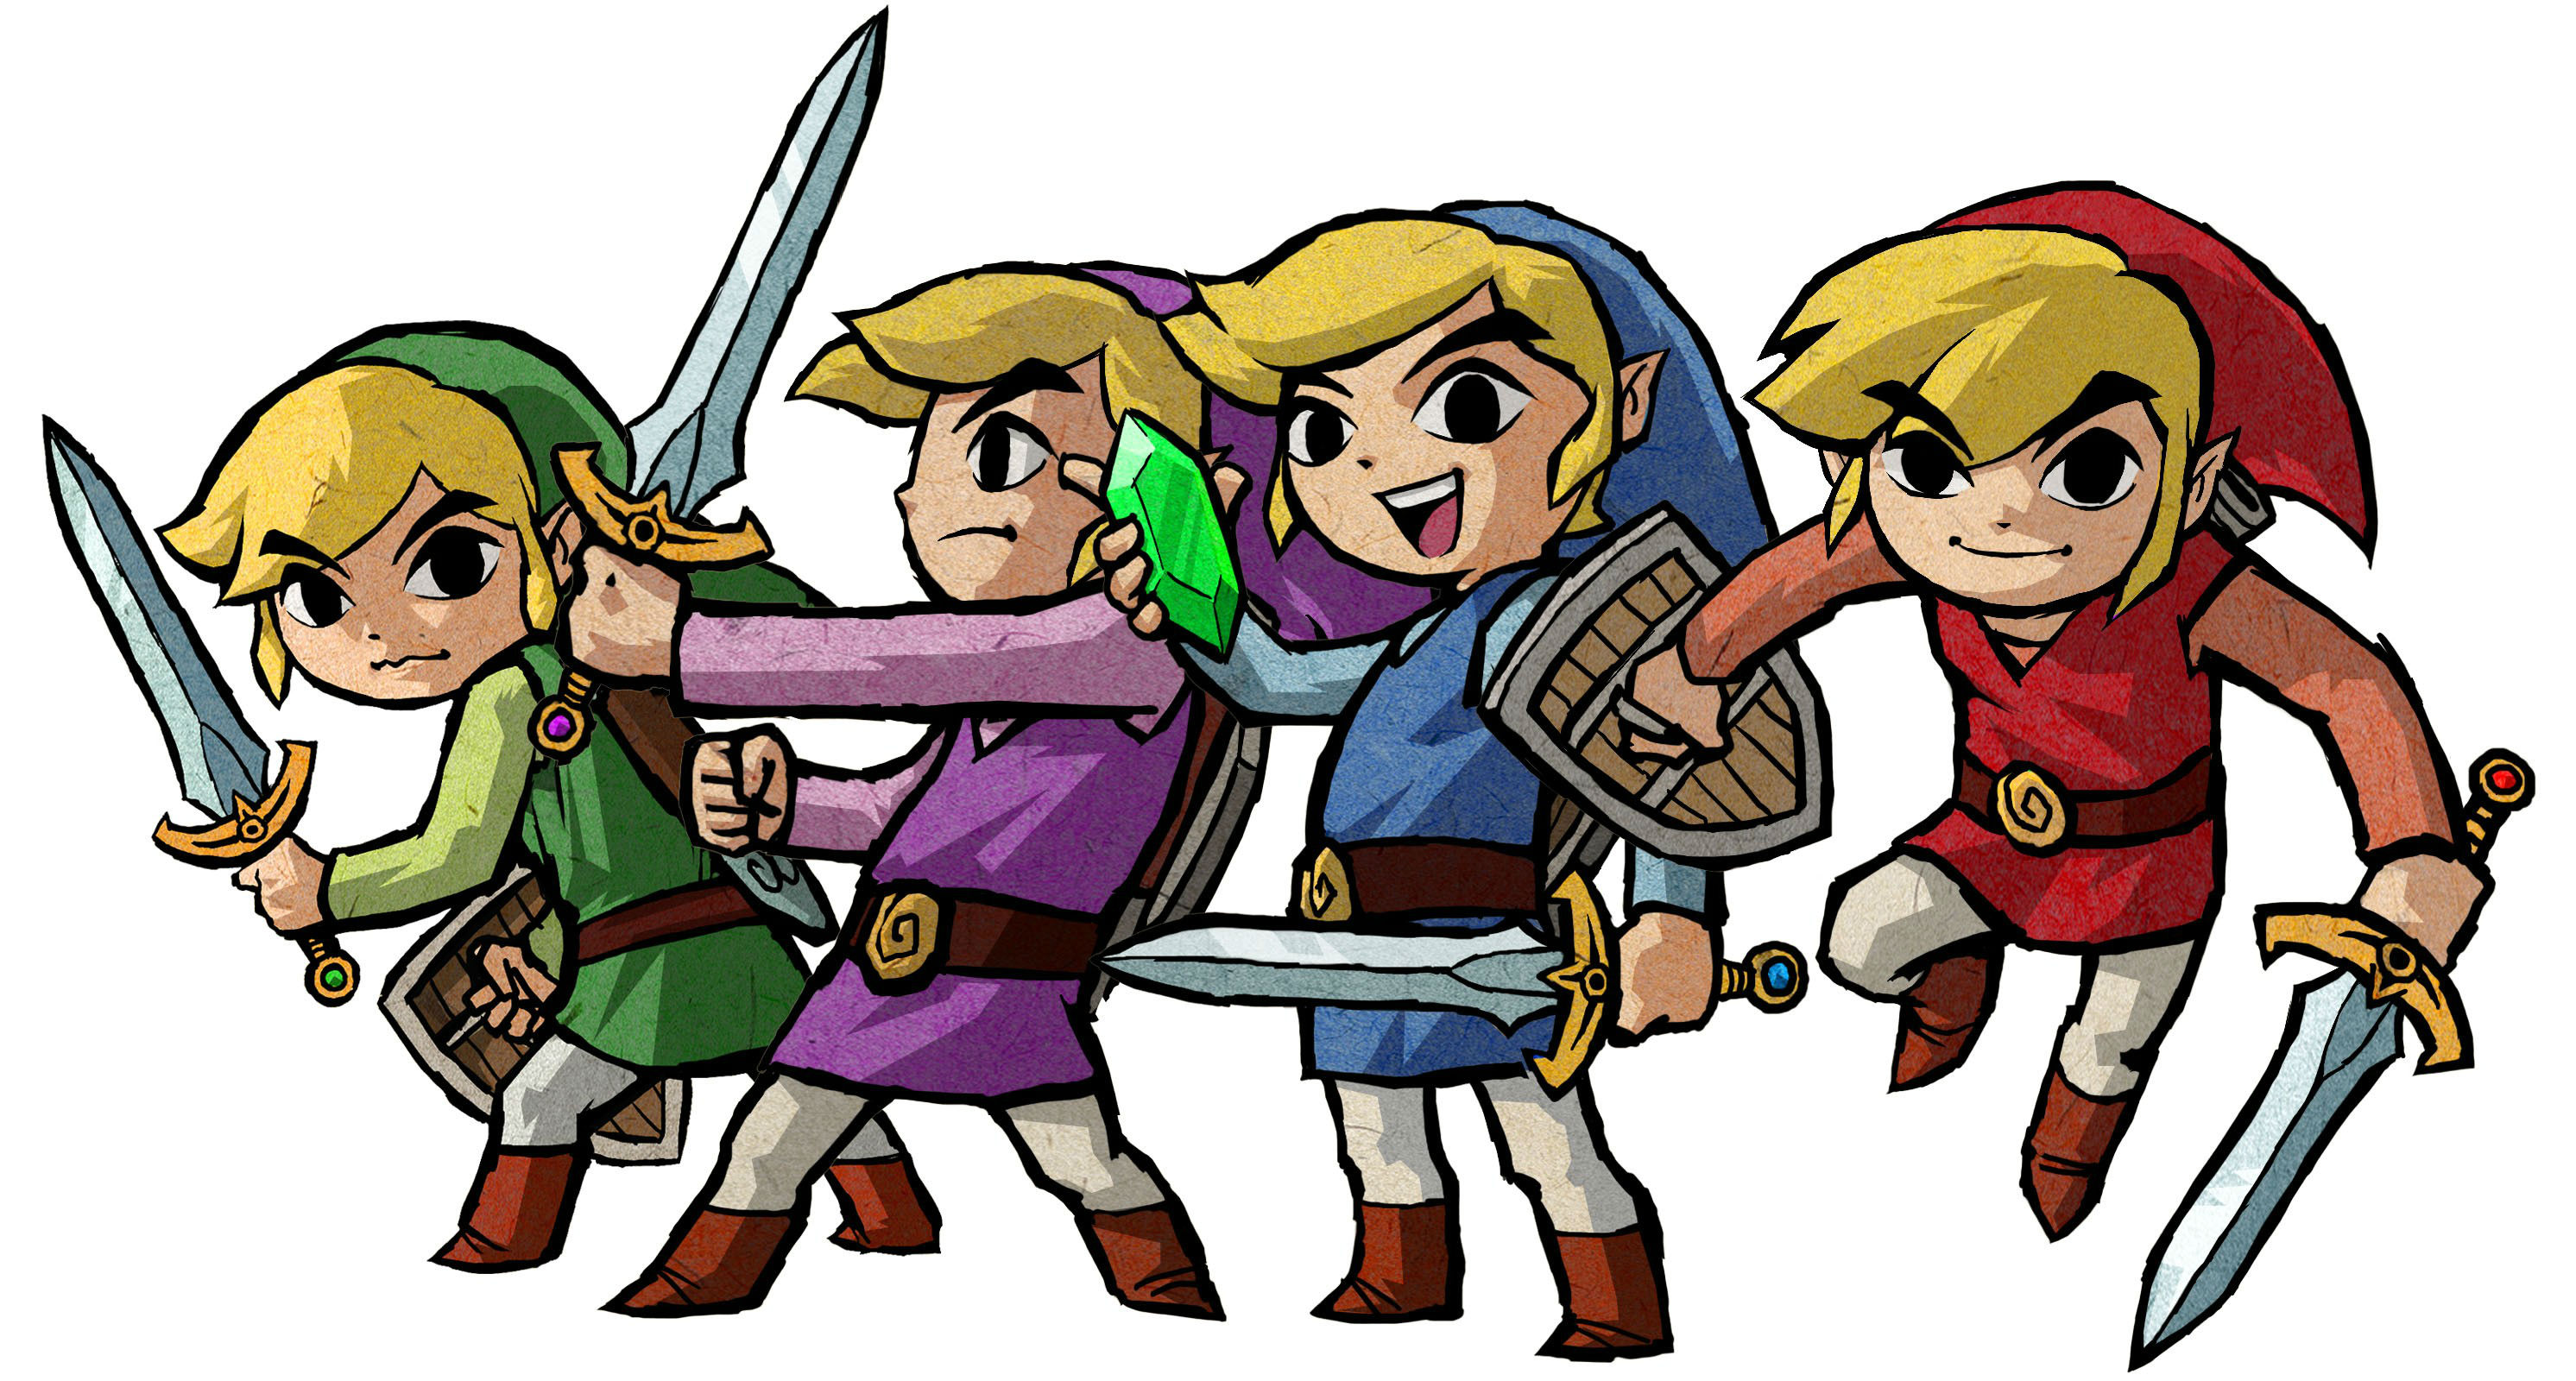 https://i0.wp.com/www.gamerfocus.co/wp-content/uploads/2014/01/the-legend-of-zelda-four-swords-anniversary-edition-gratis-nintendo-3ds-tiempo-limitado-1.jpg